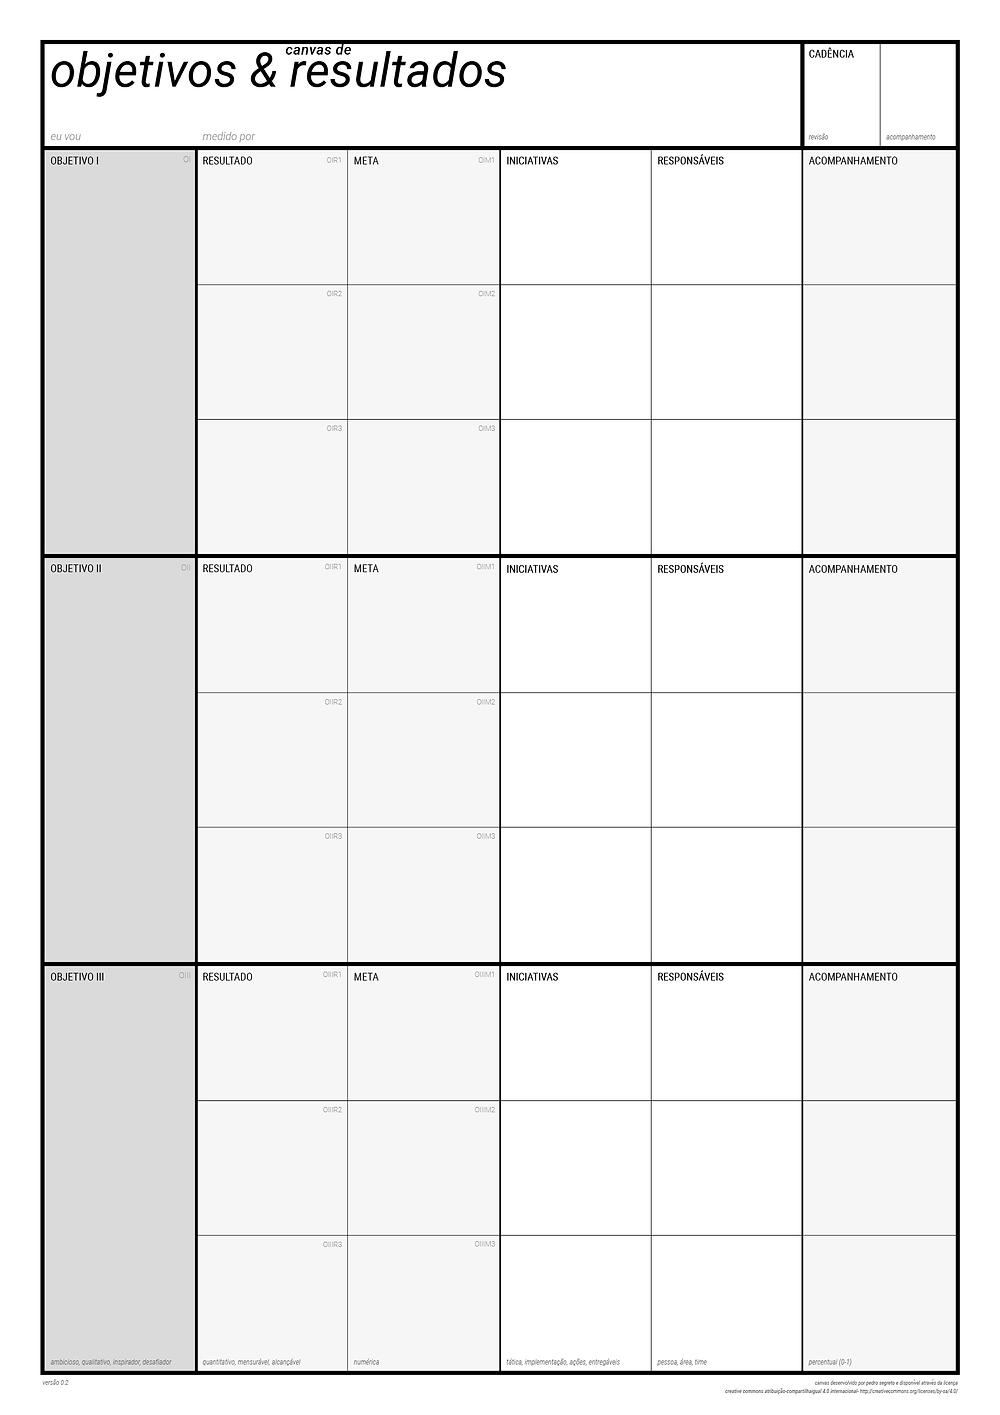 canvas de objetivos e resultados